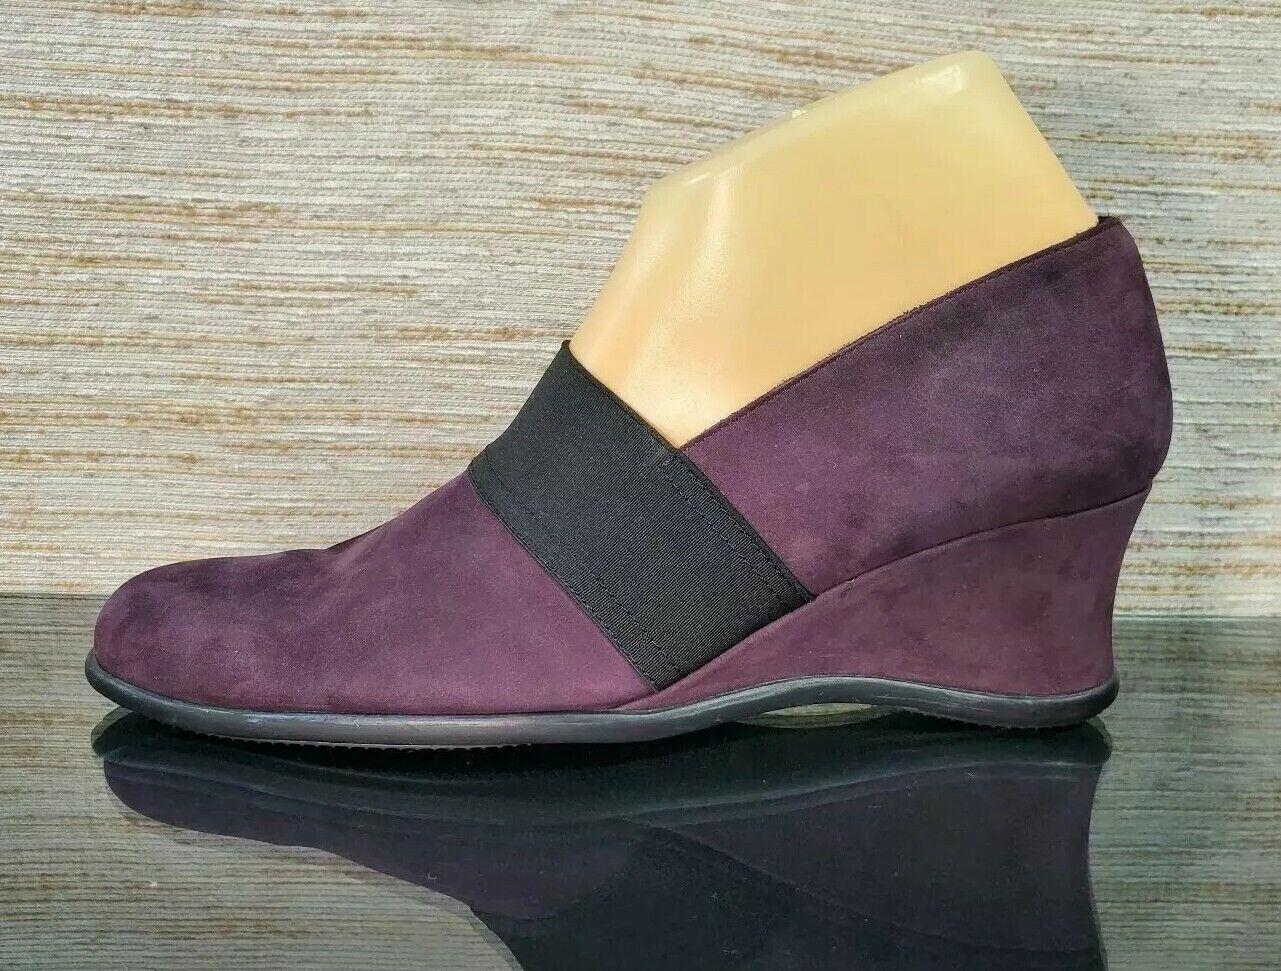 ARCHE France Purple Yam Nuback Slip-on Wedge Comfort Shoes Womens Sz 39 /US 8